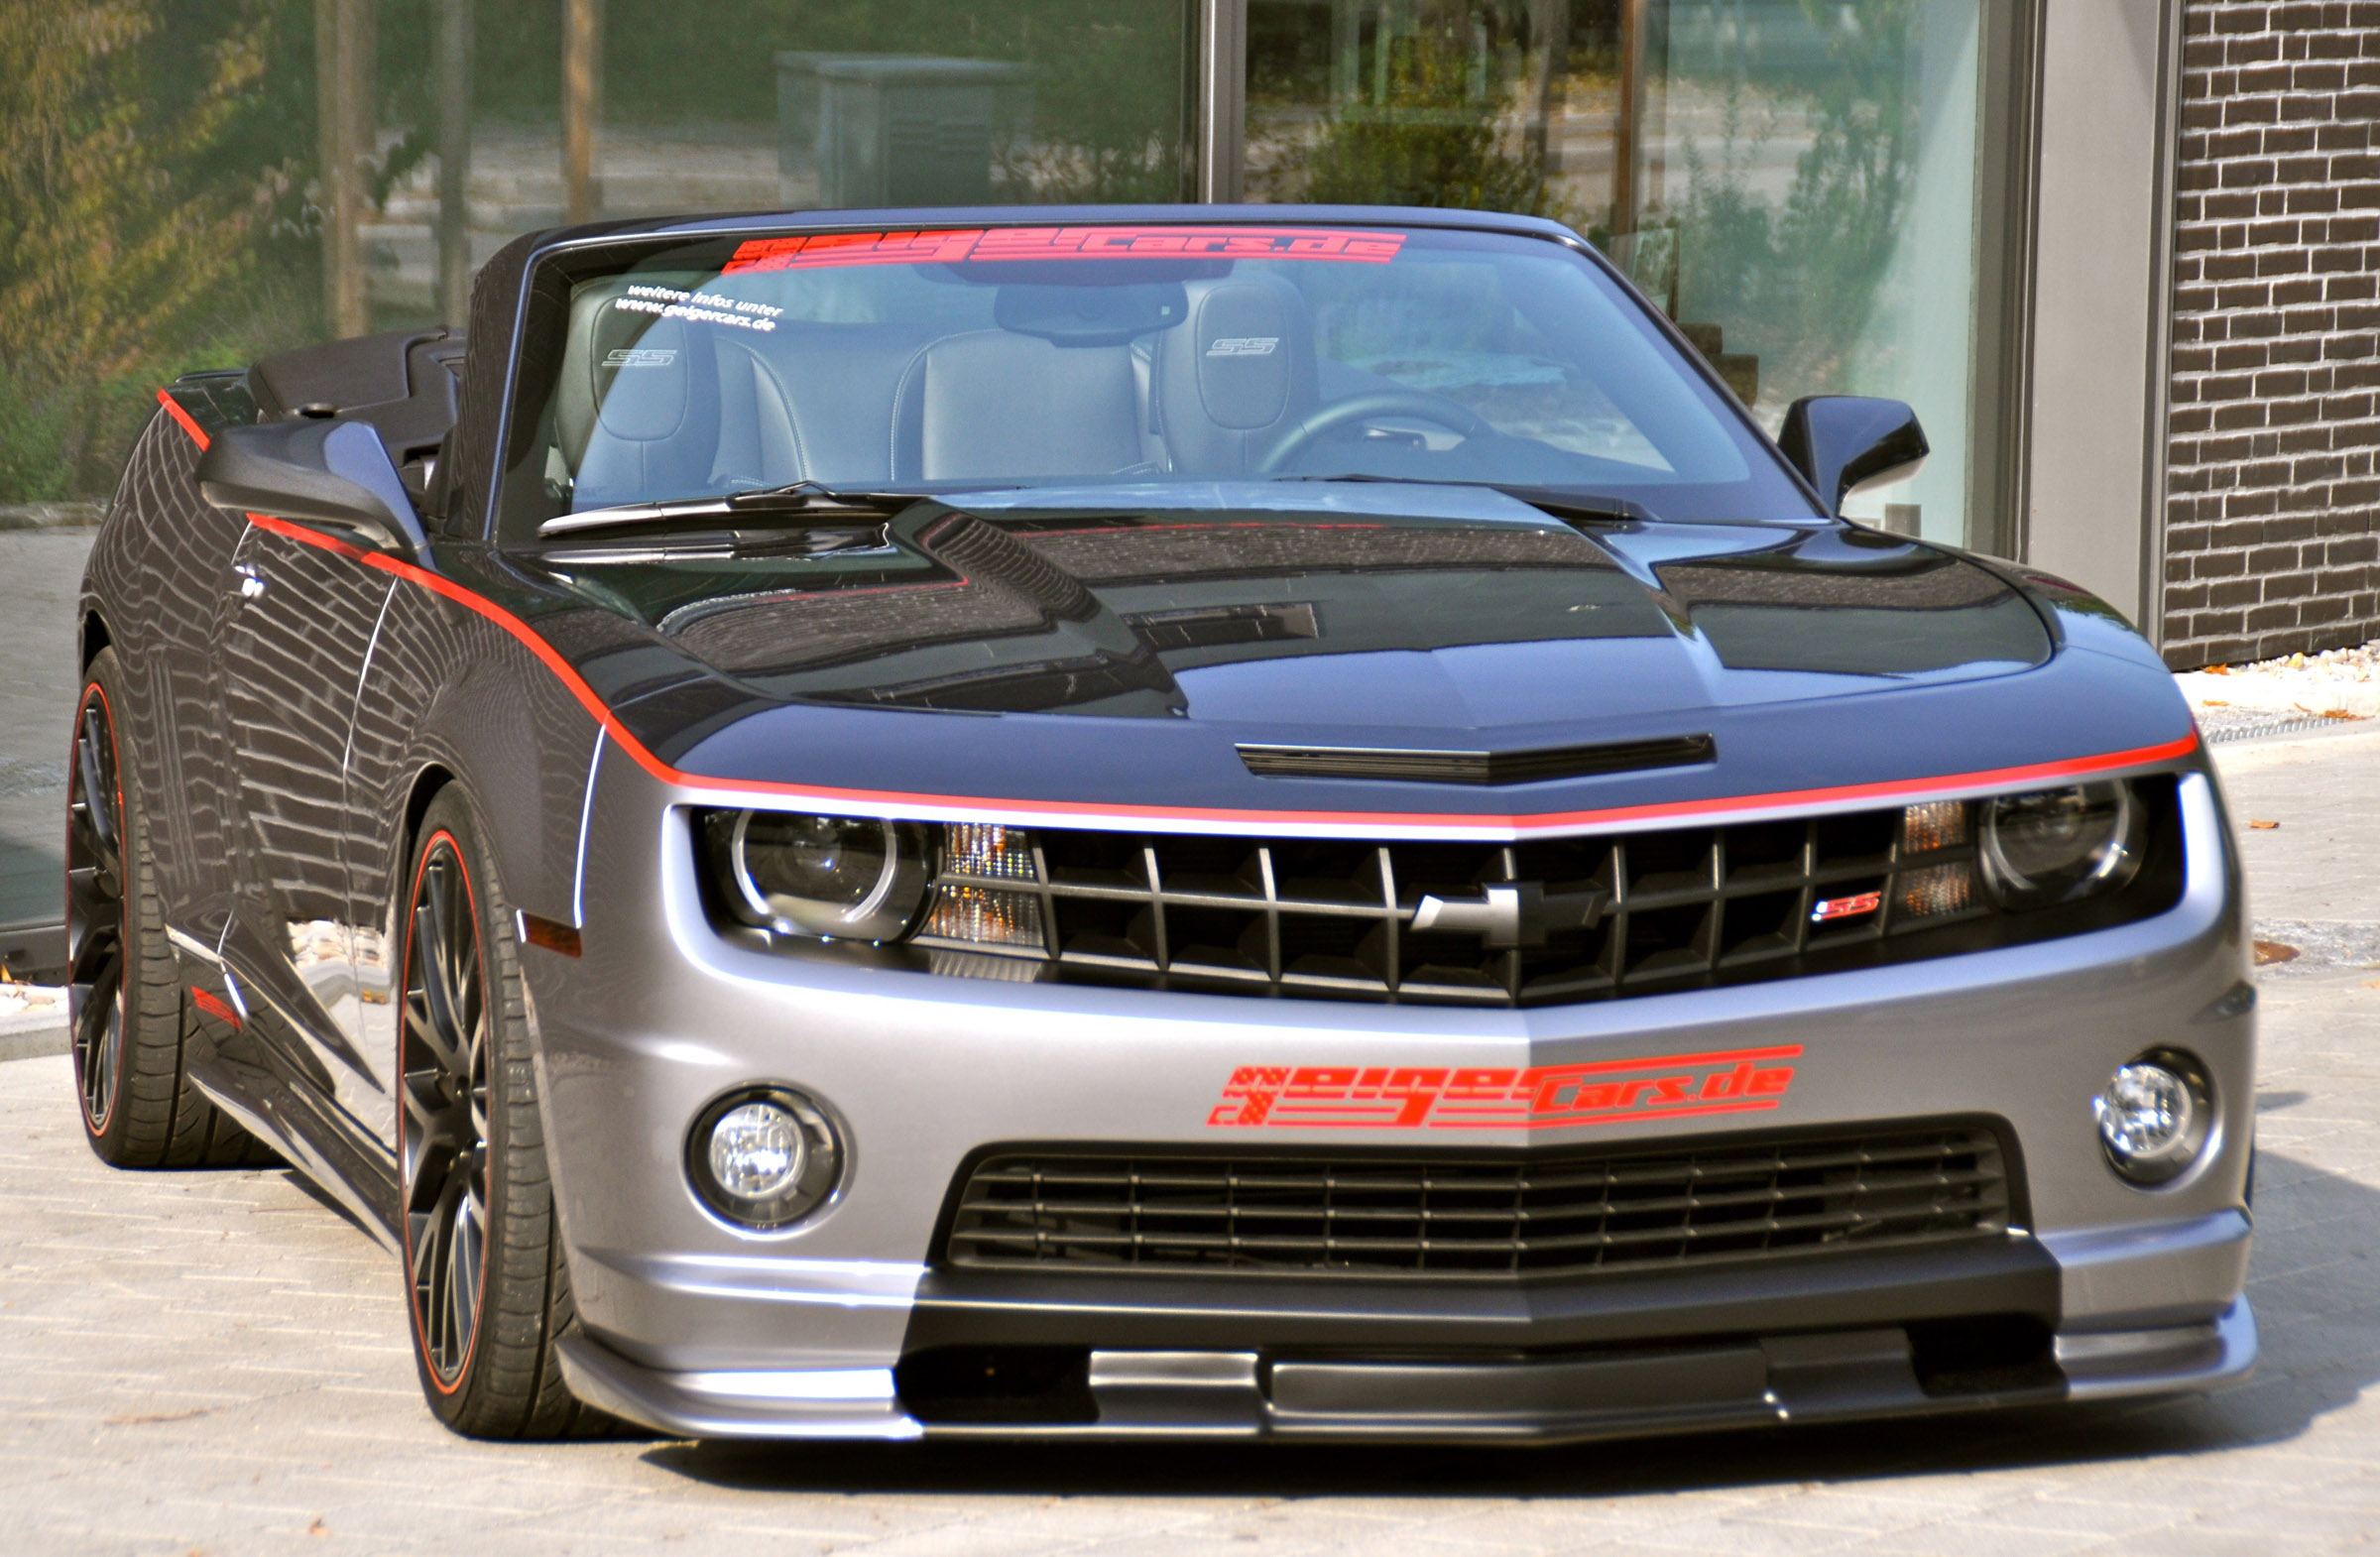 Chevrolet Camaro Ss Convertible Geiger Compressor